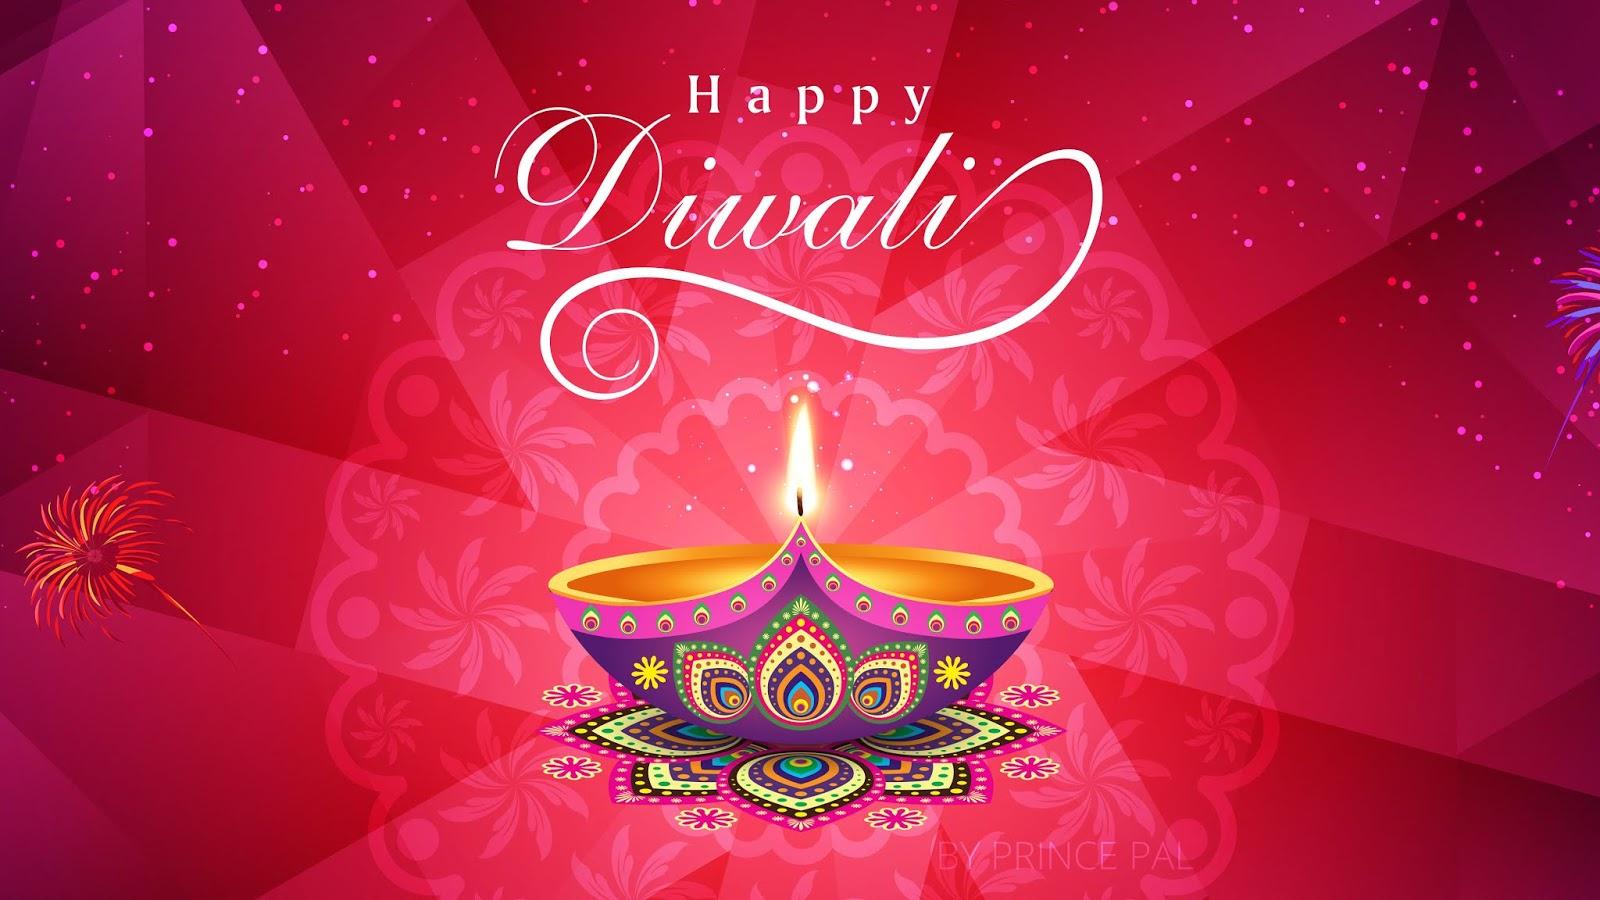 Great Diwali Images